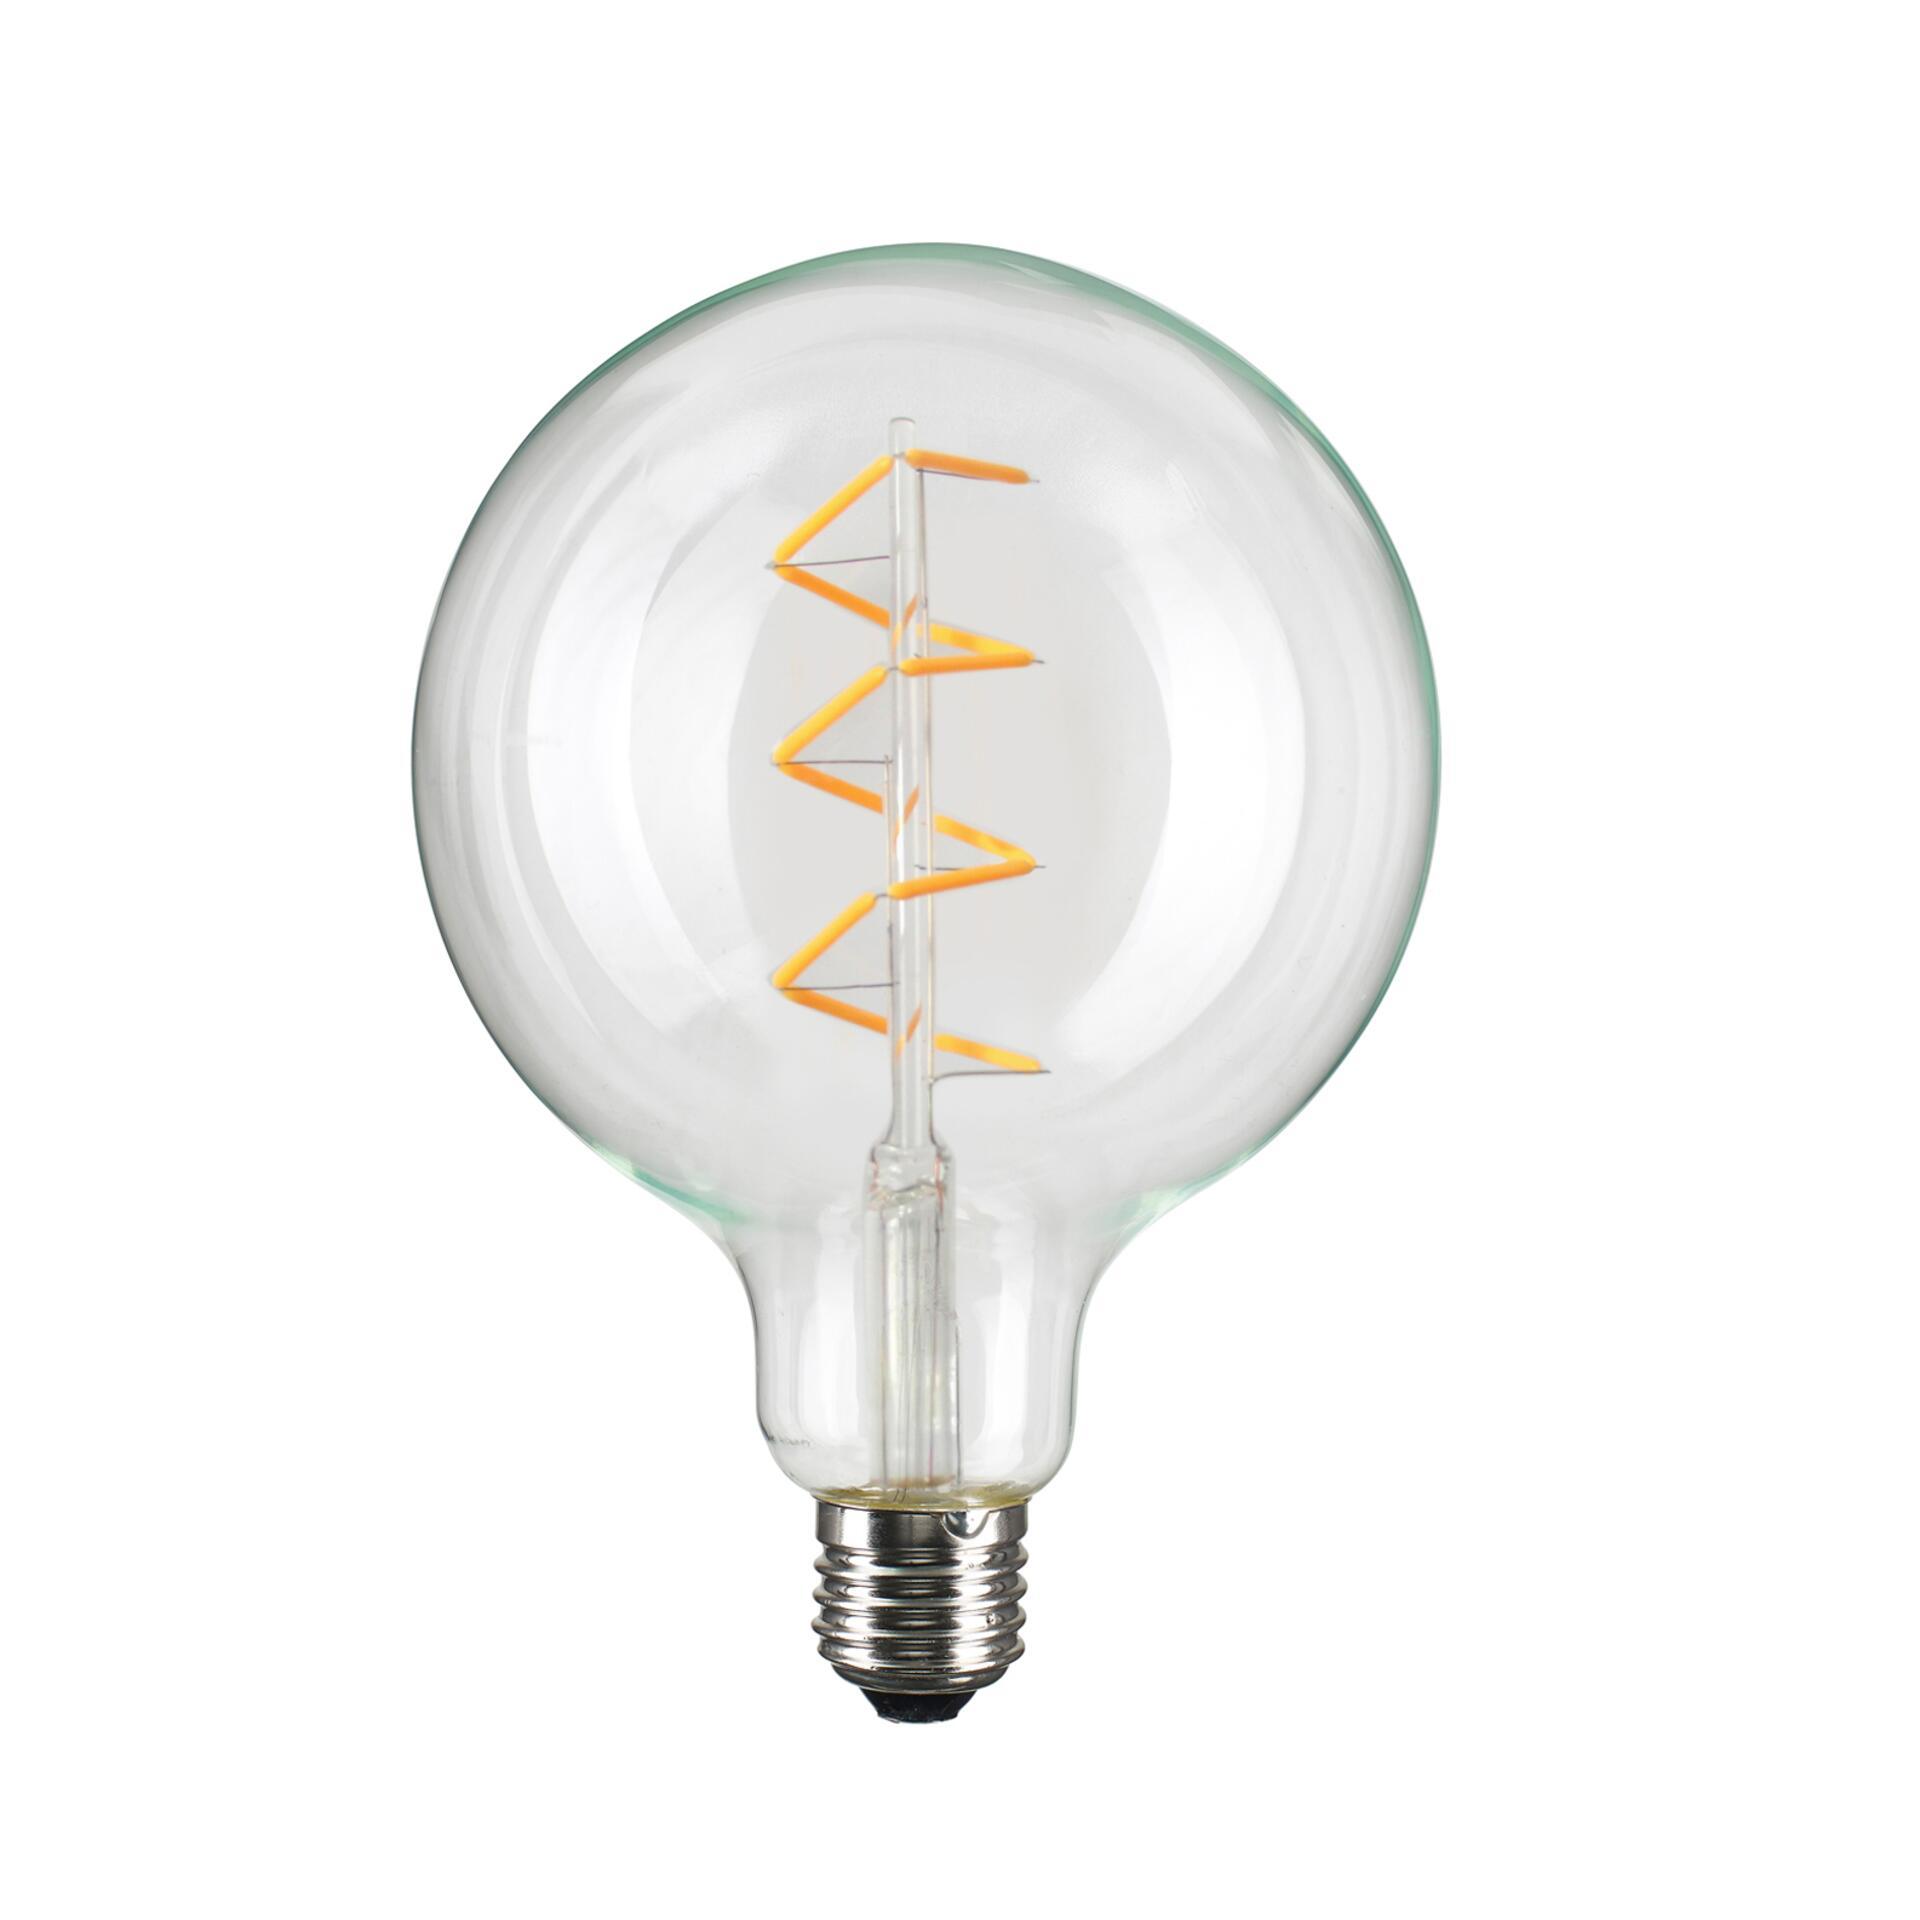 Nud LED Glühbirne Globe 125 mm dimmbar Spiral